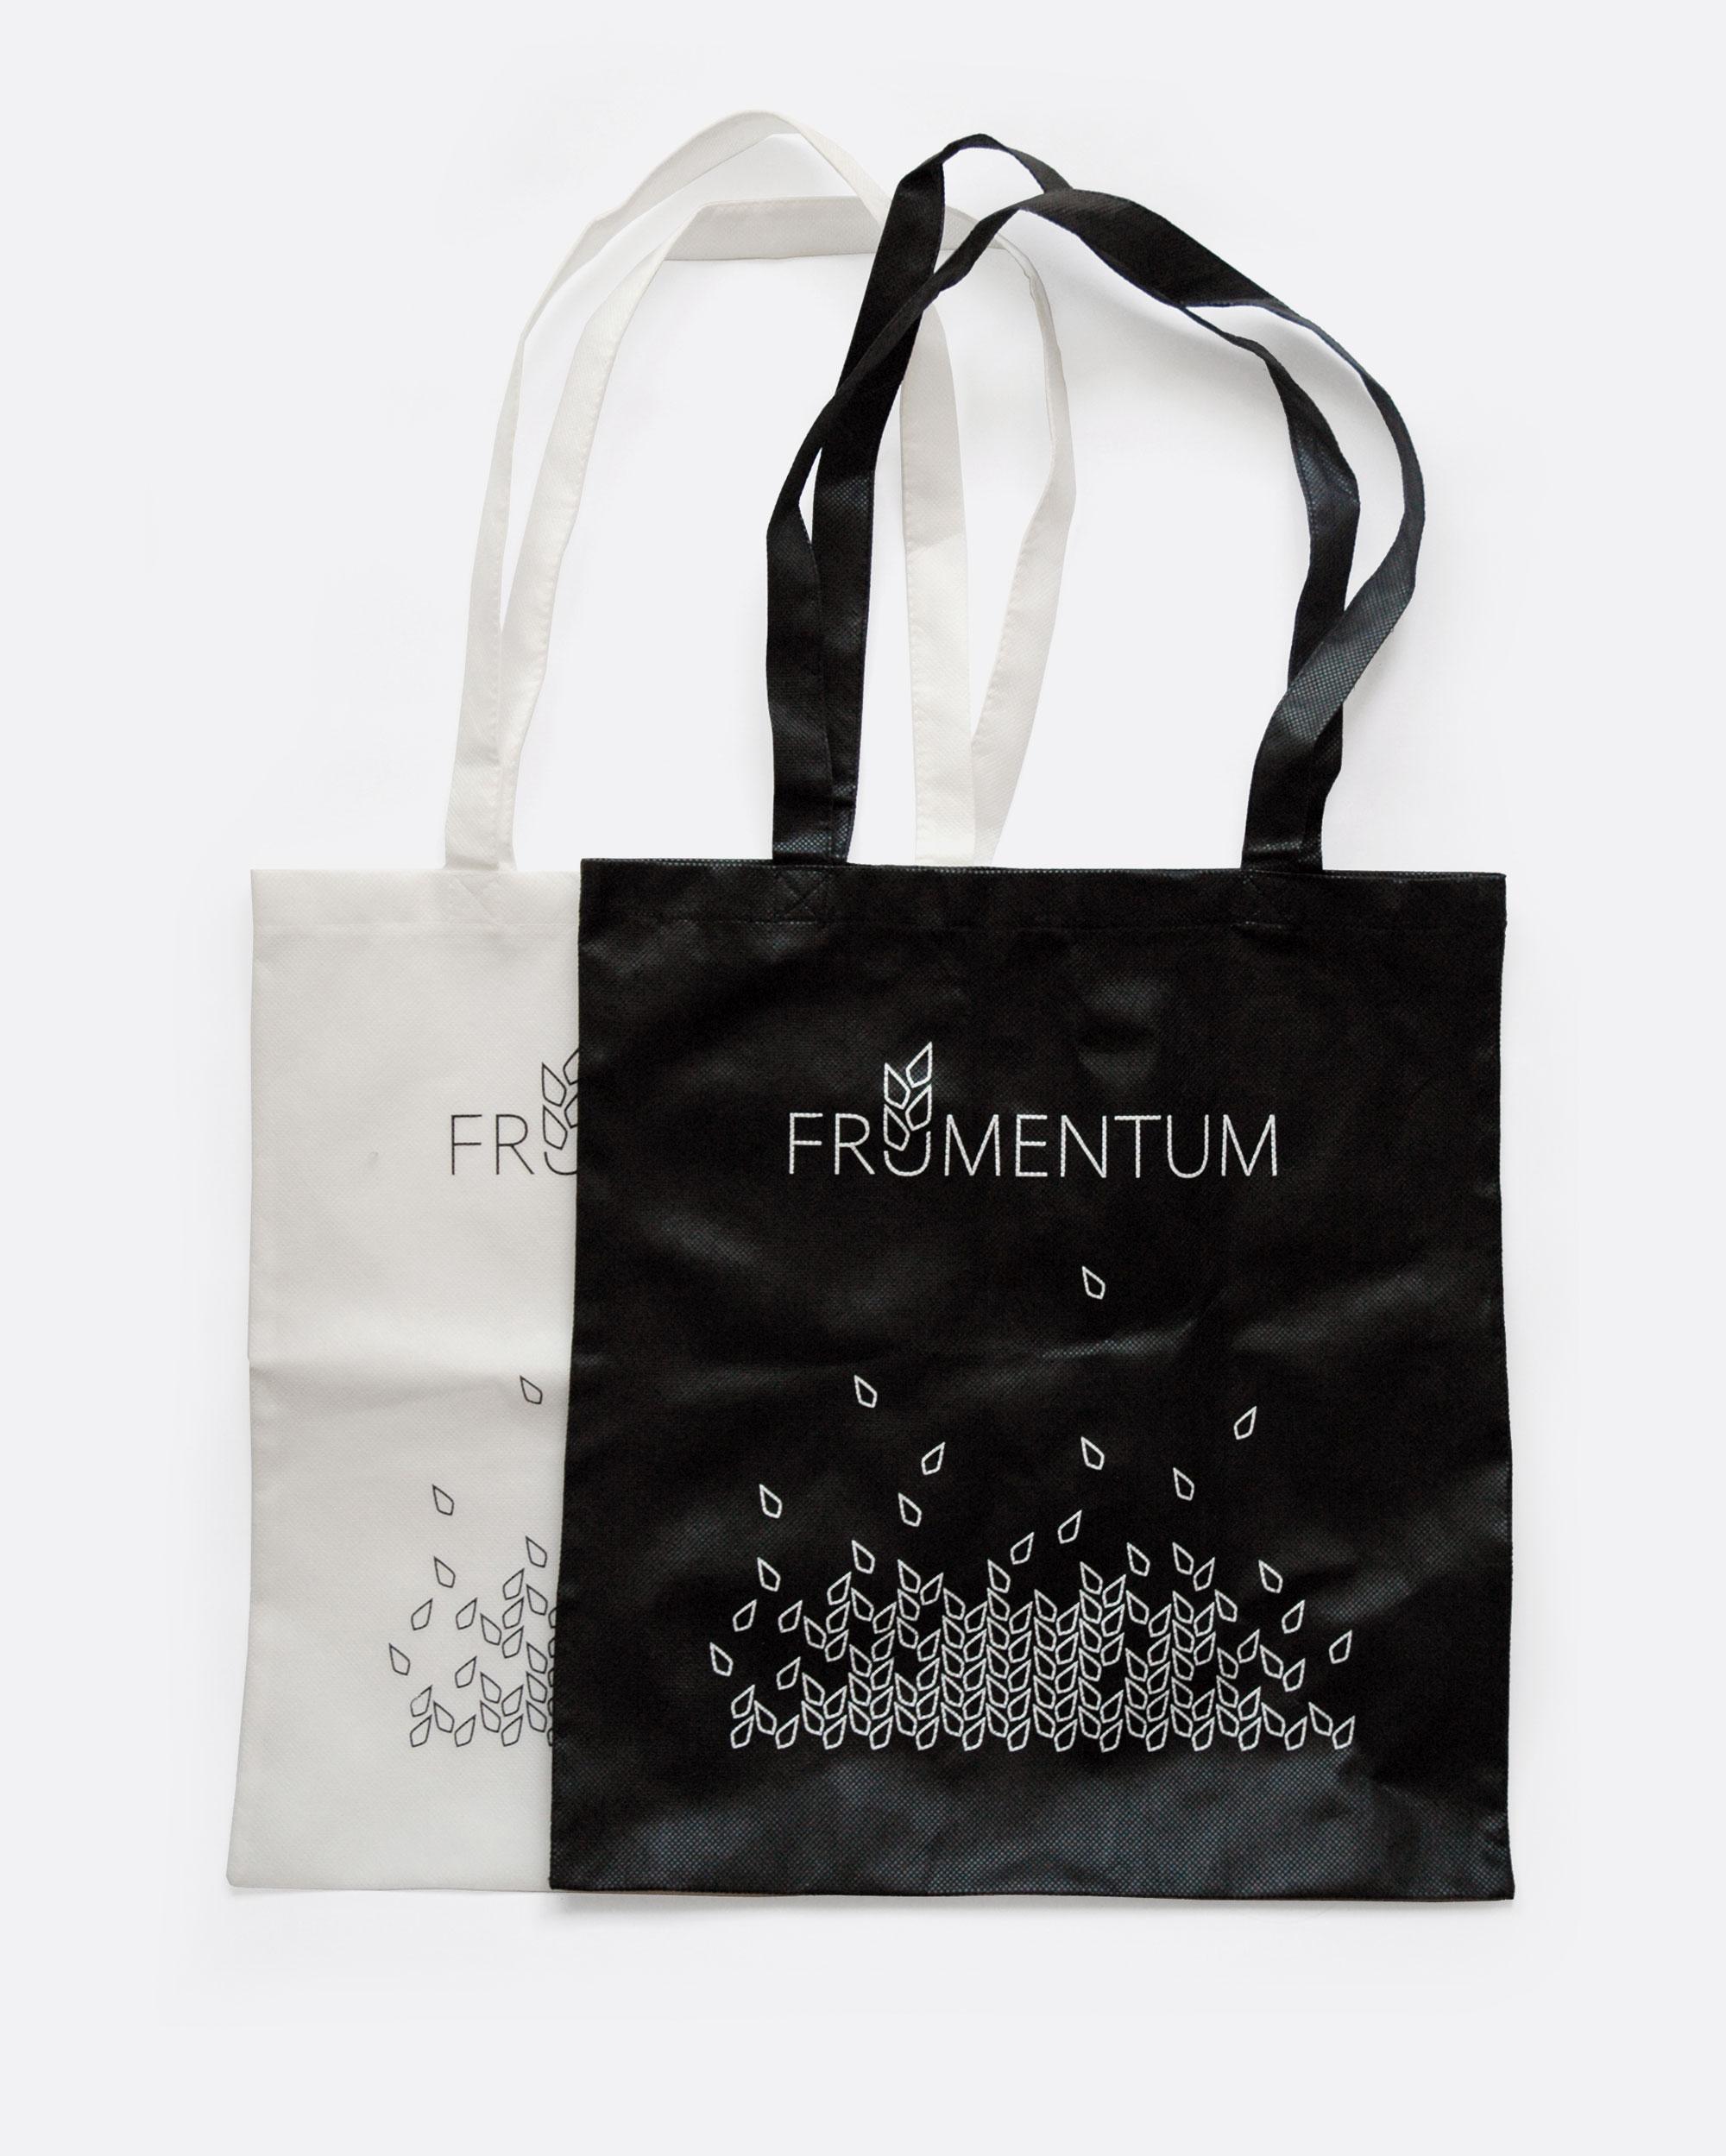 masavukmanovic.com - frumentum bakeries - branding 02